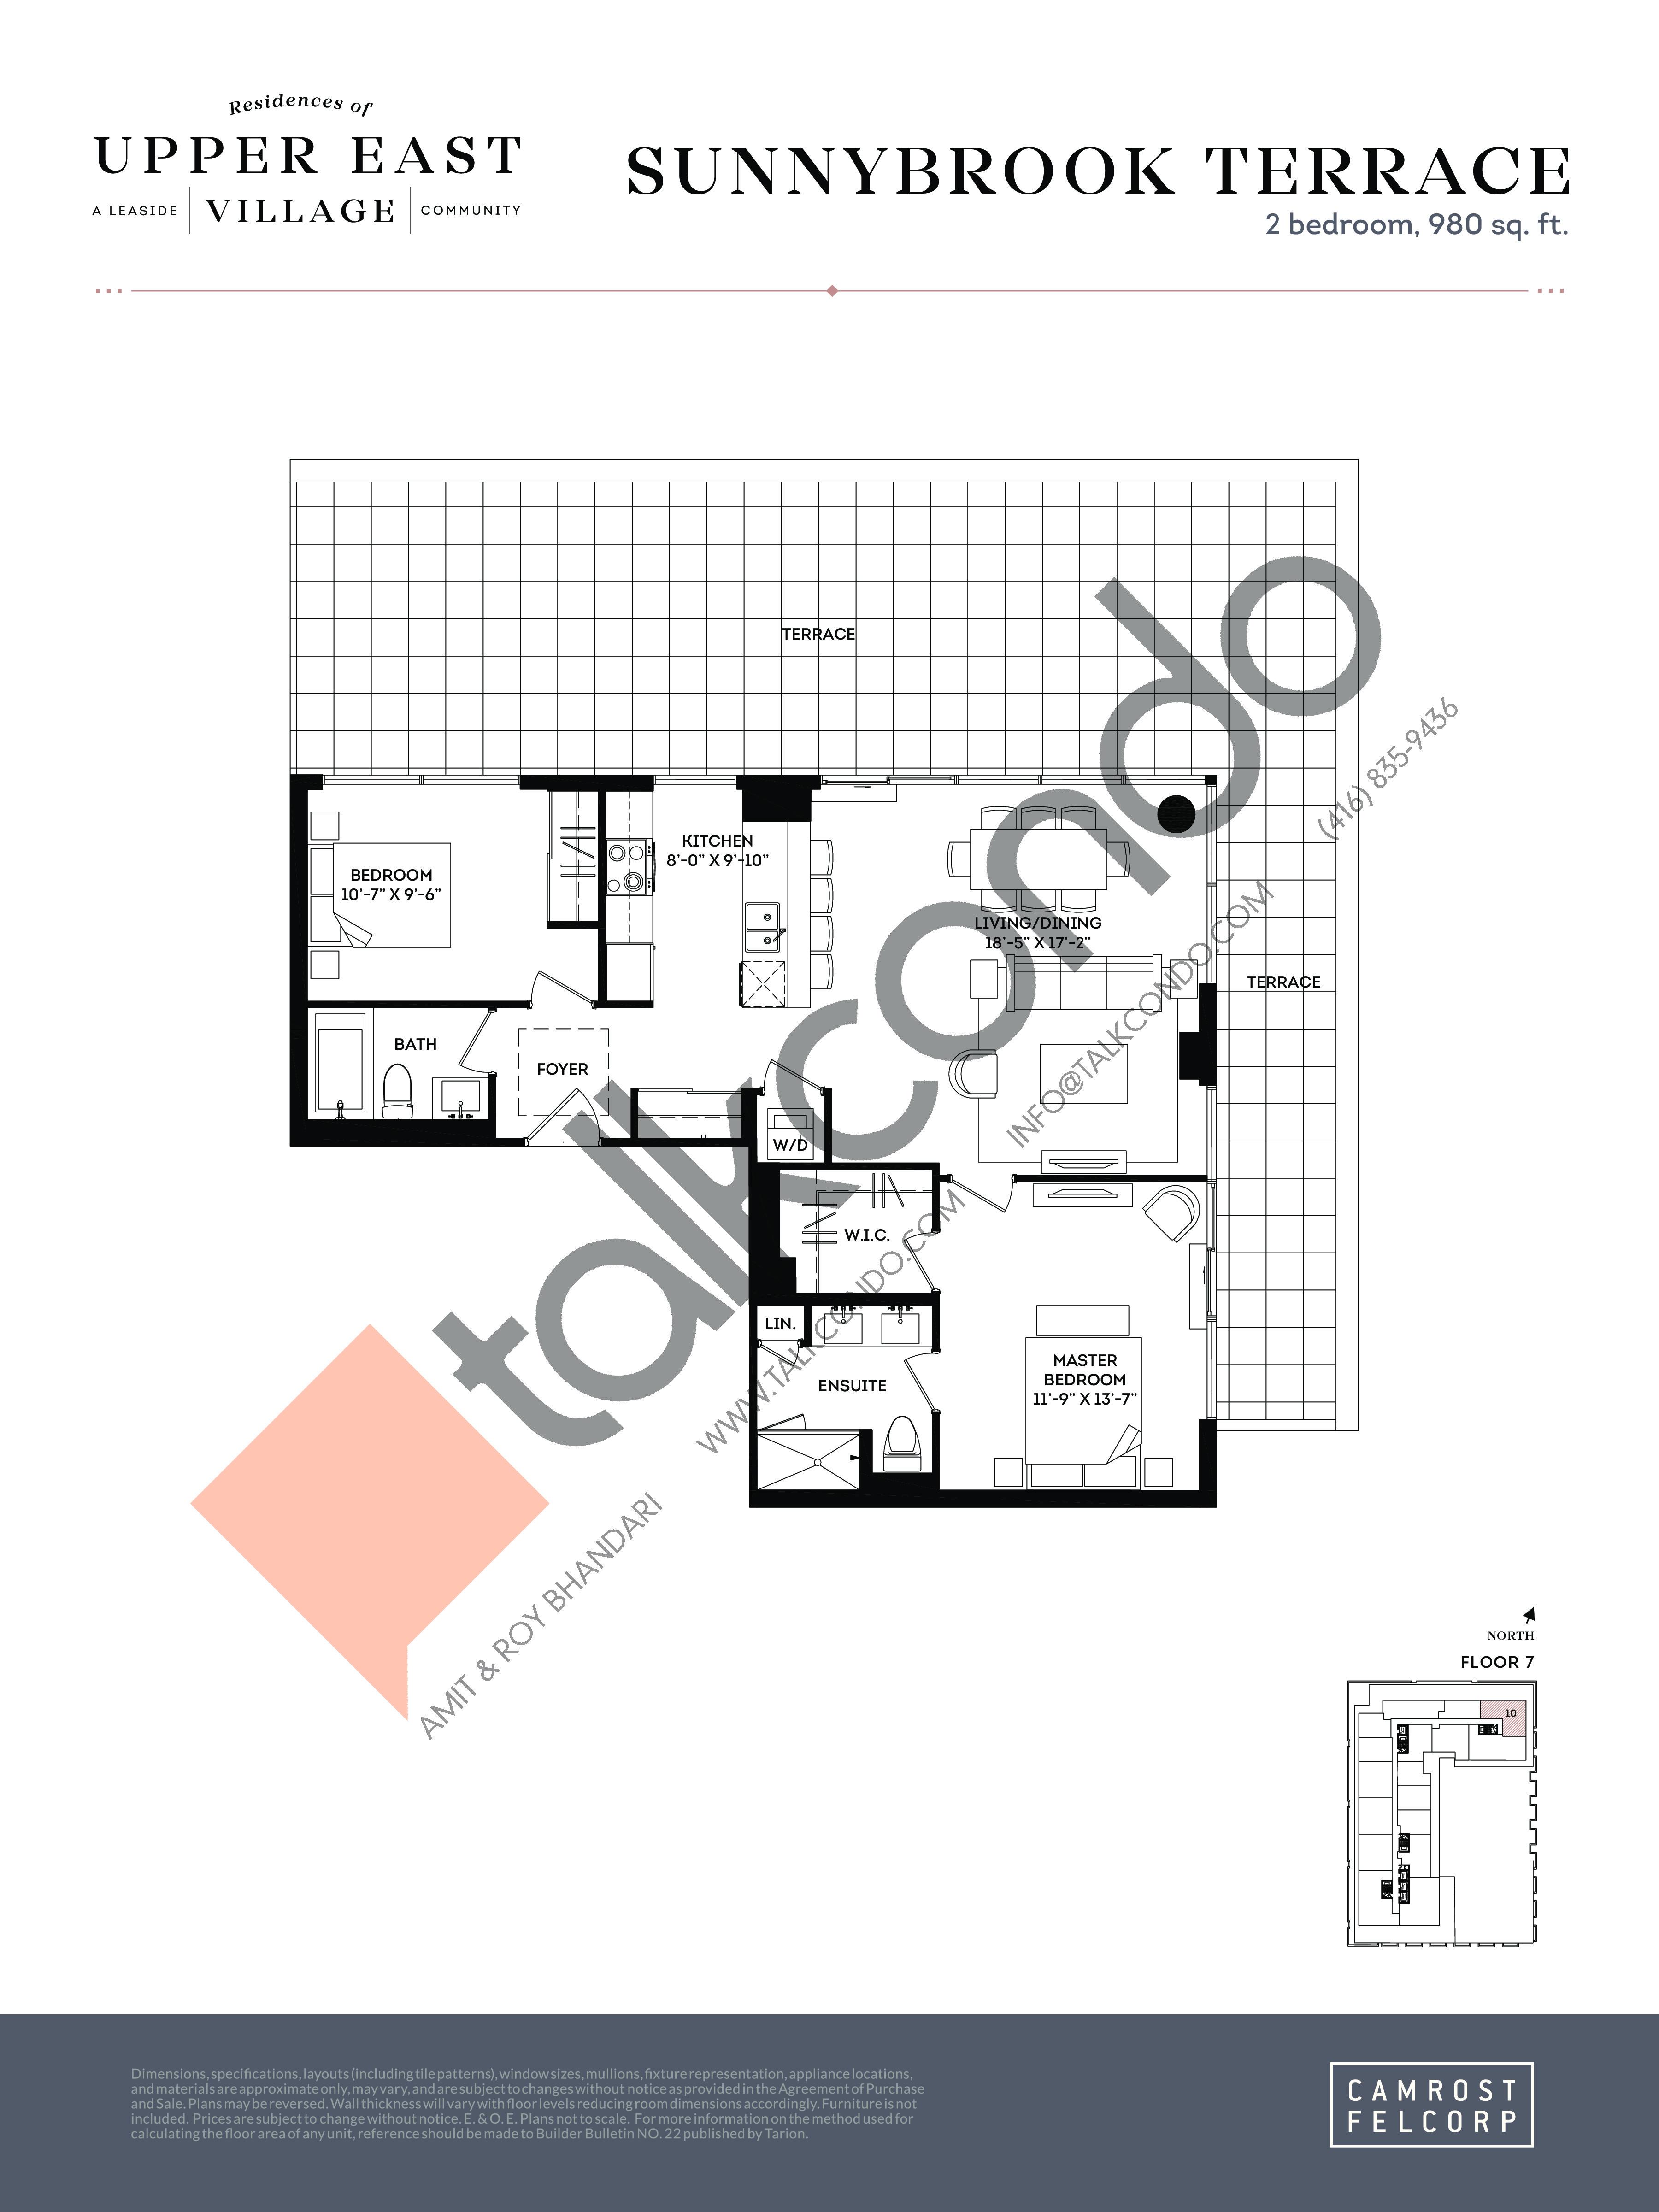 Sunnybrook Terrace Floor Plan at Upper East Village Condos - 980 sq.ft